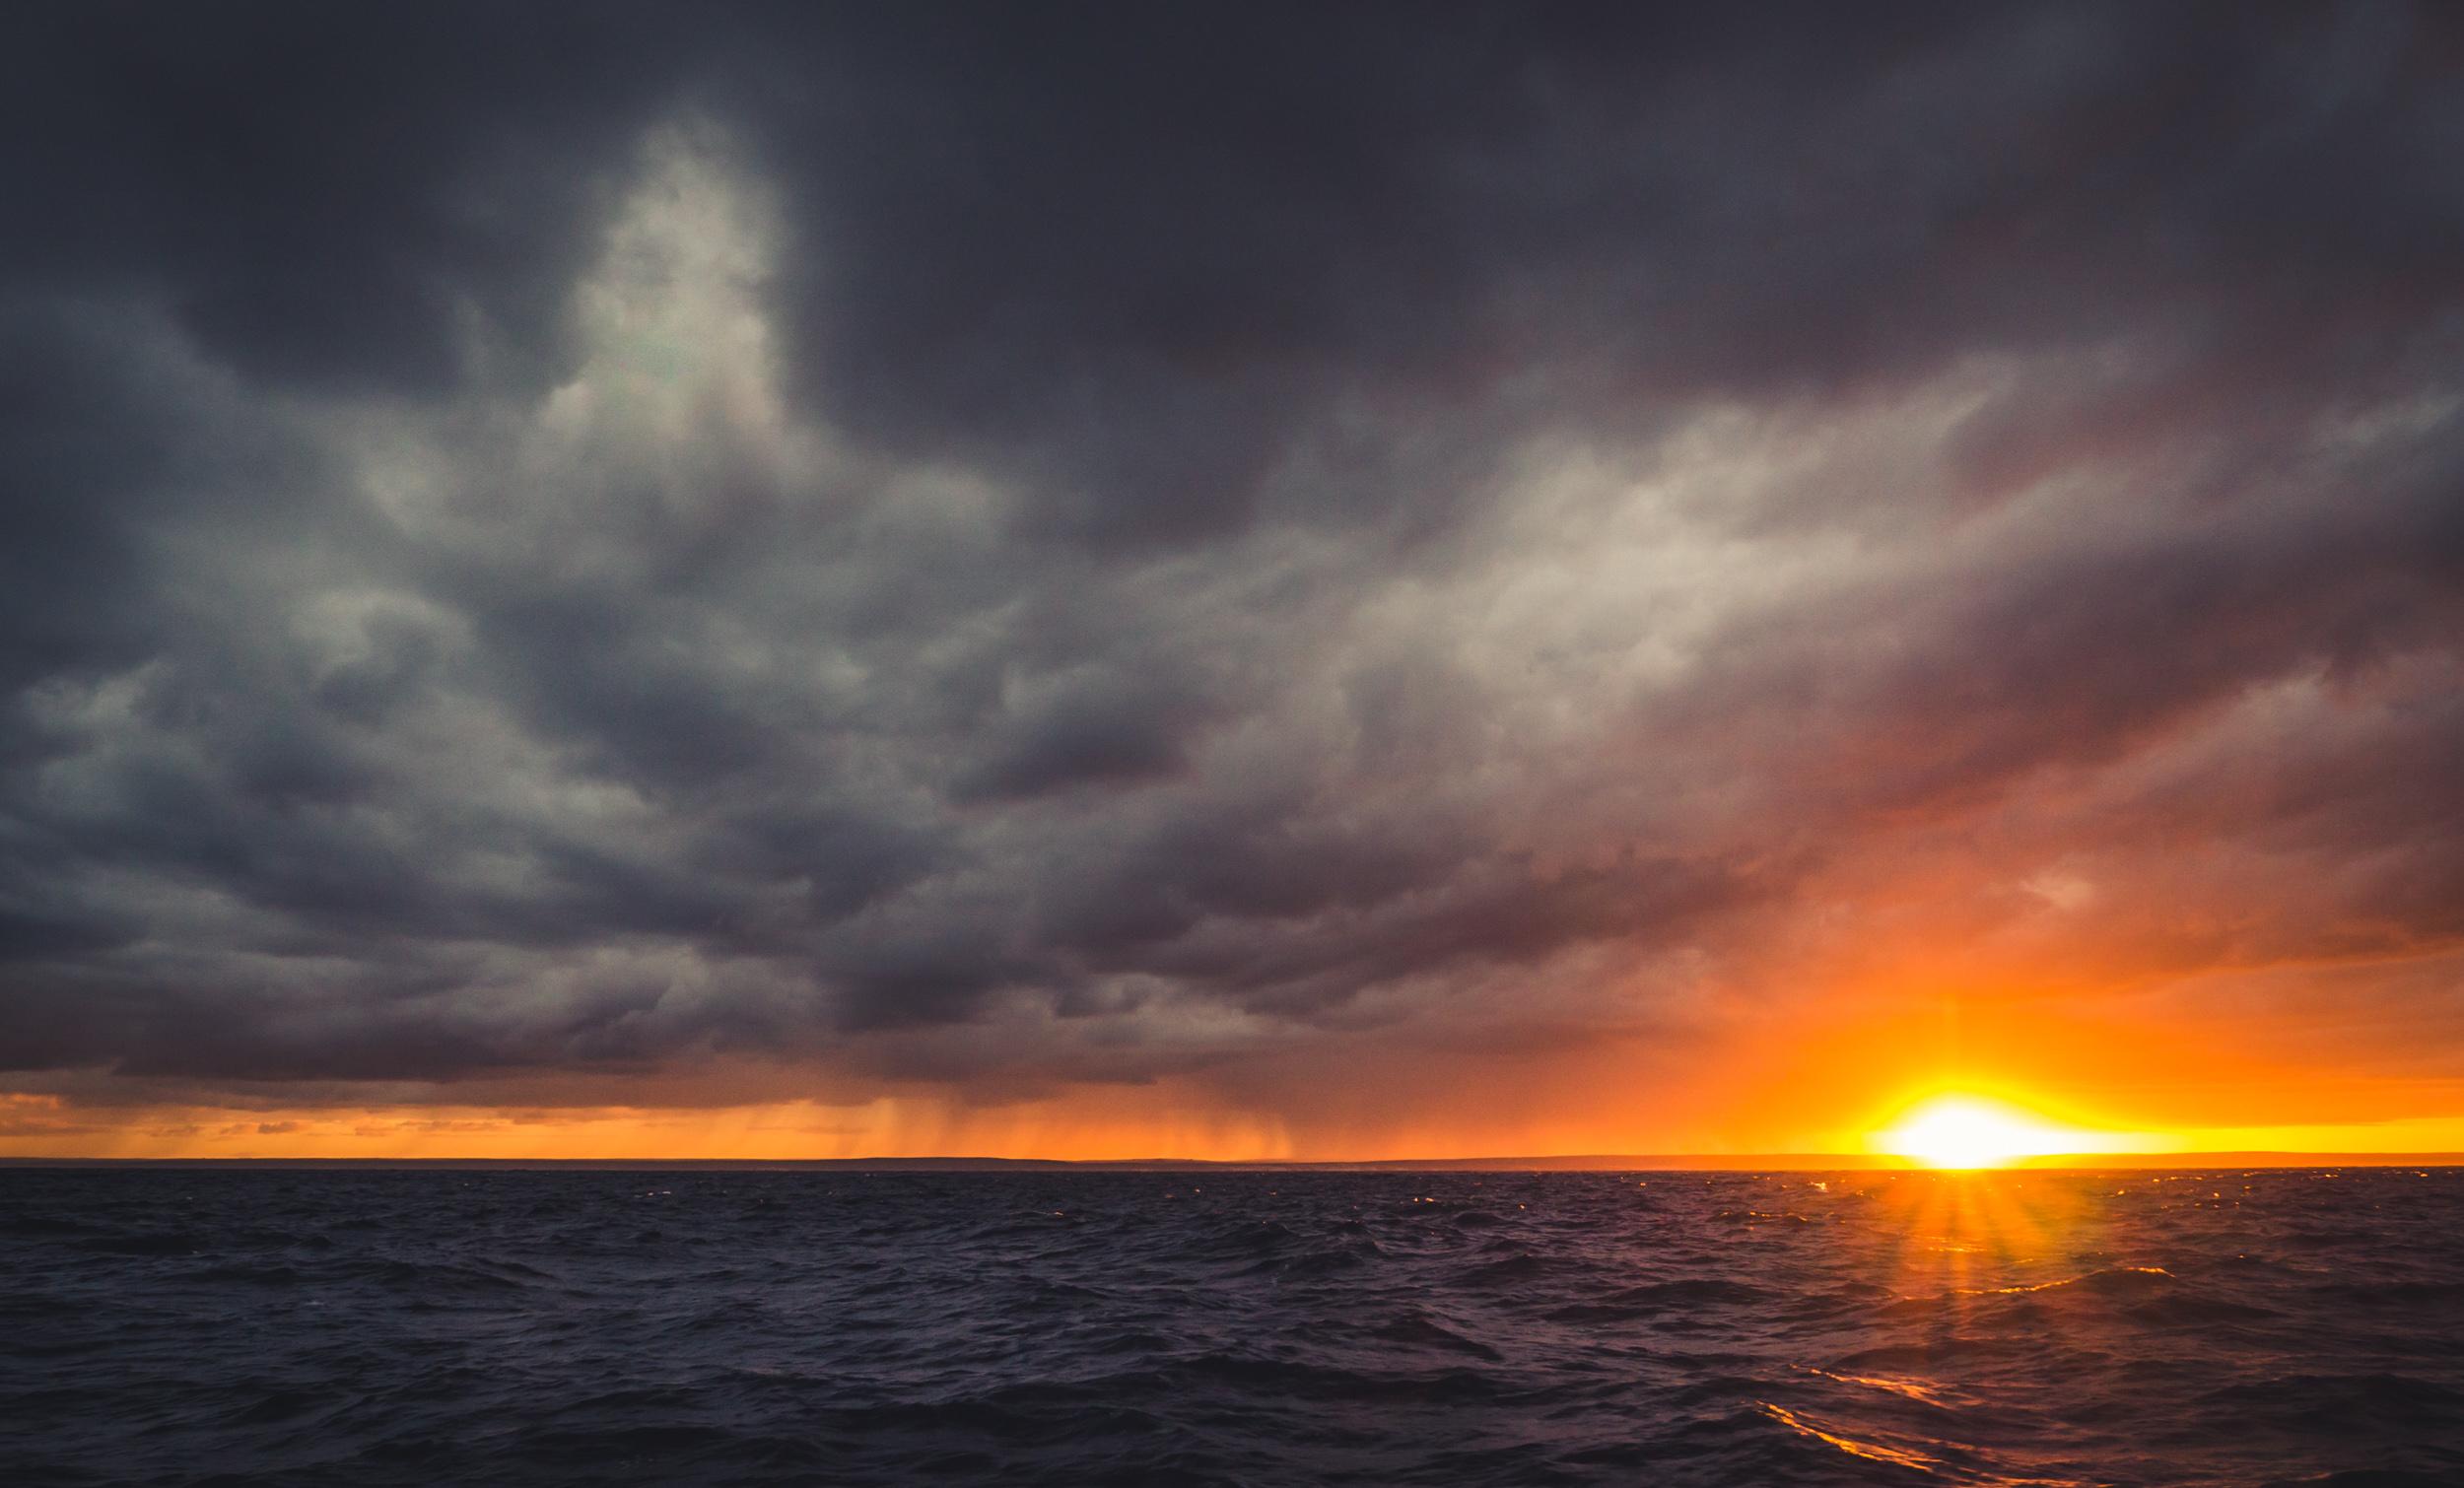 _20 Sunrise over ocean Dark Clouds.jpg